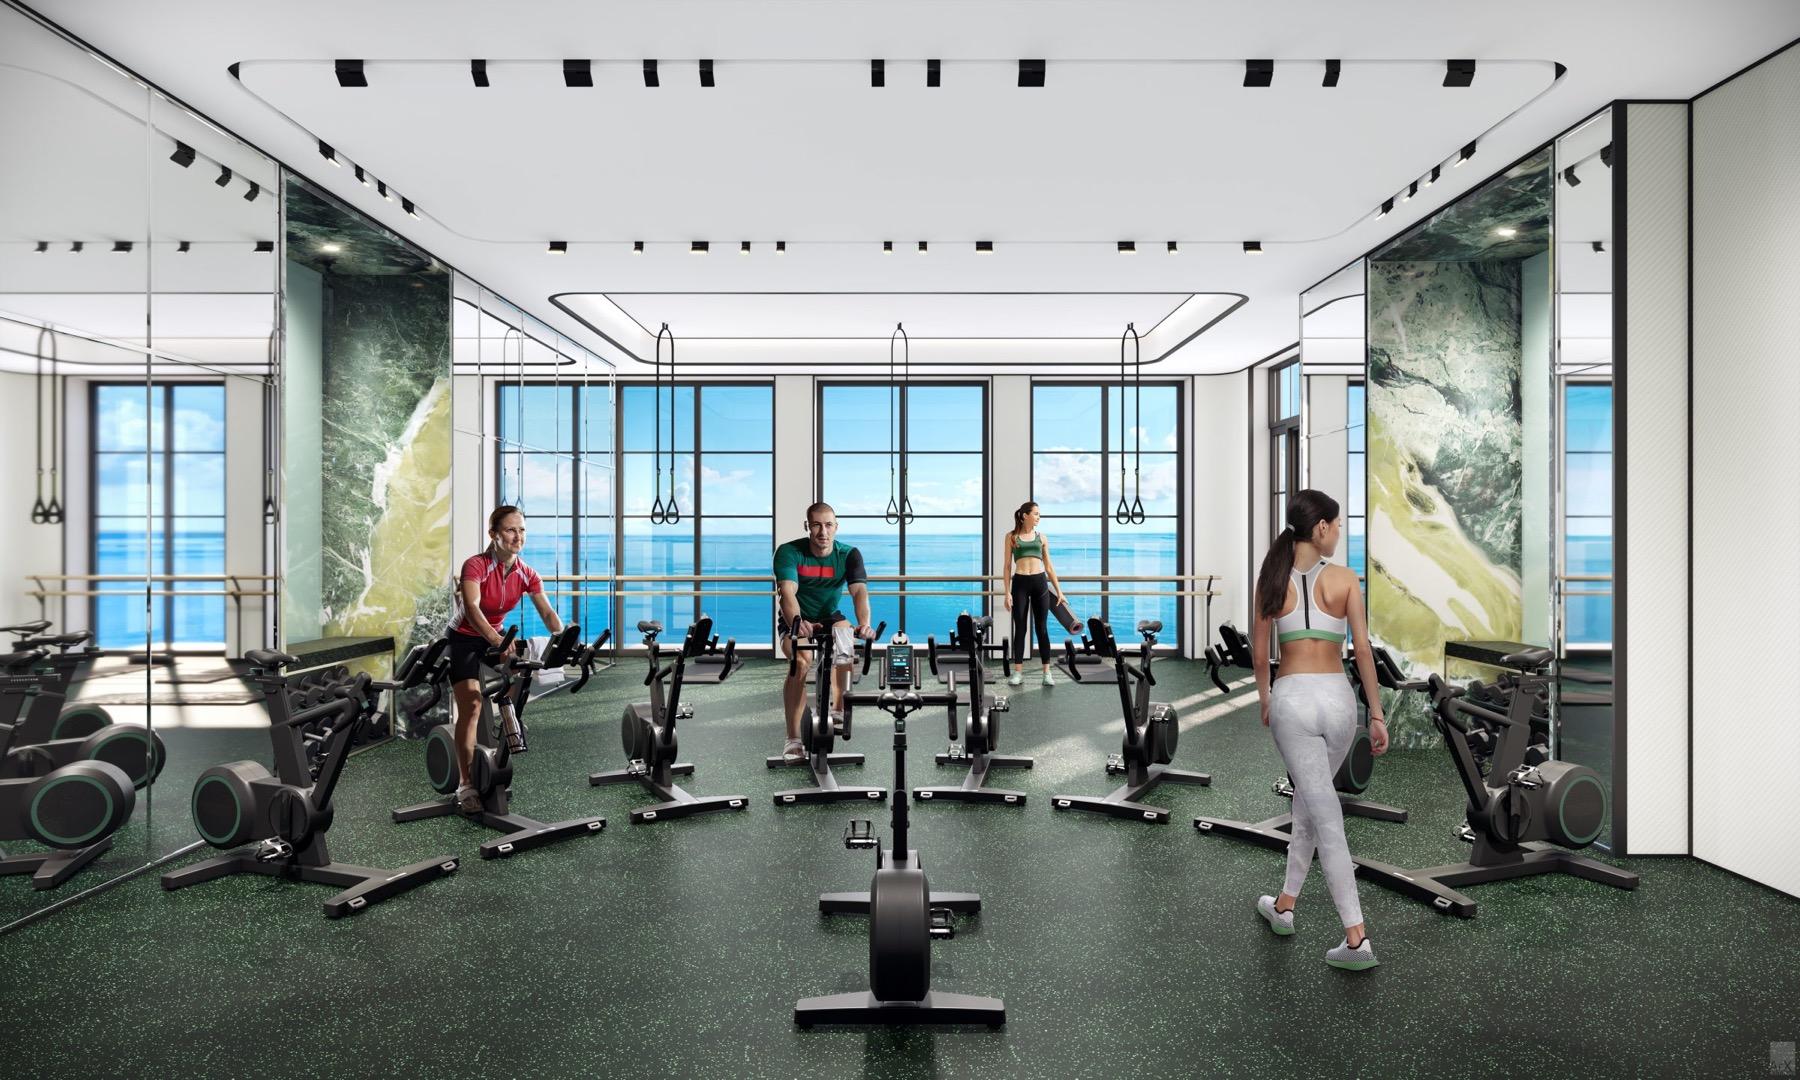 AcquaFit Fitness & Wellness Center image 4